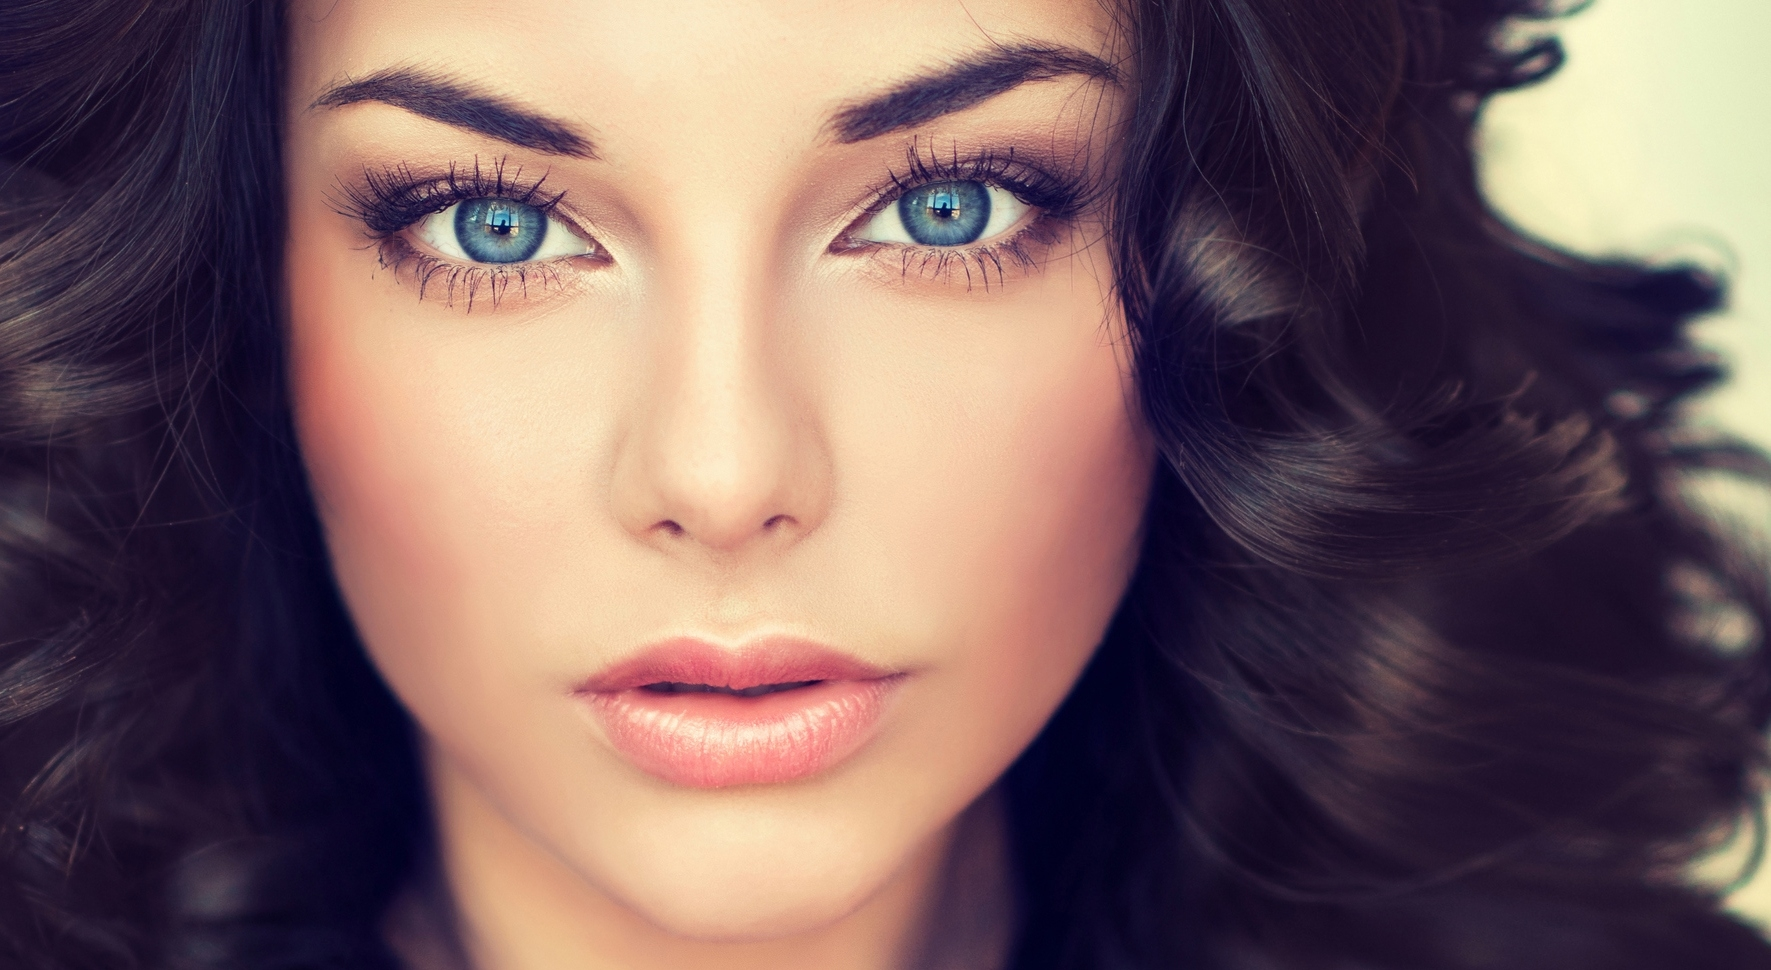 Best Eye Shadow Colors For Blue Eyes   Lovetoknow regarding What Color Eyeshadow For Blue Eyes And Black Hair